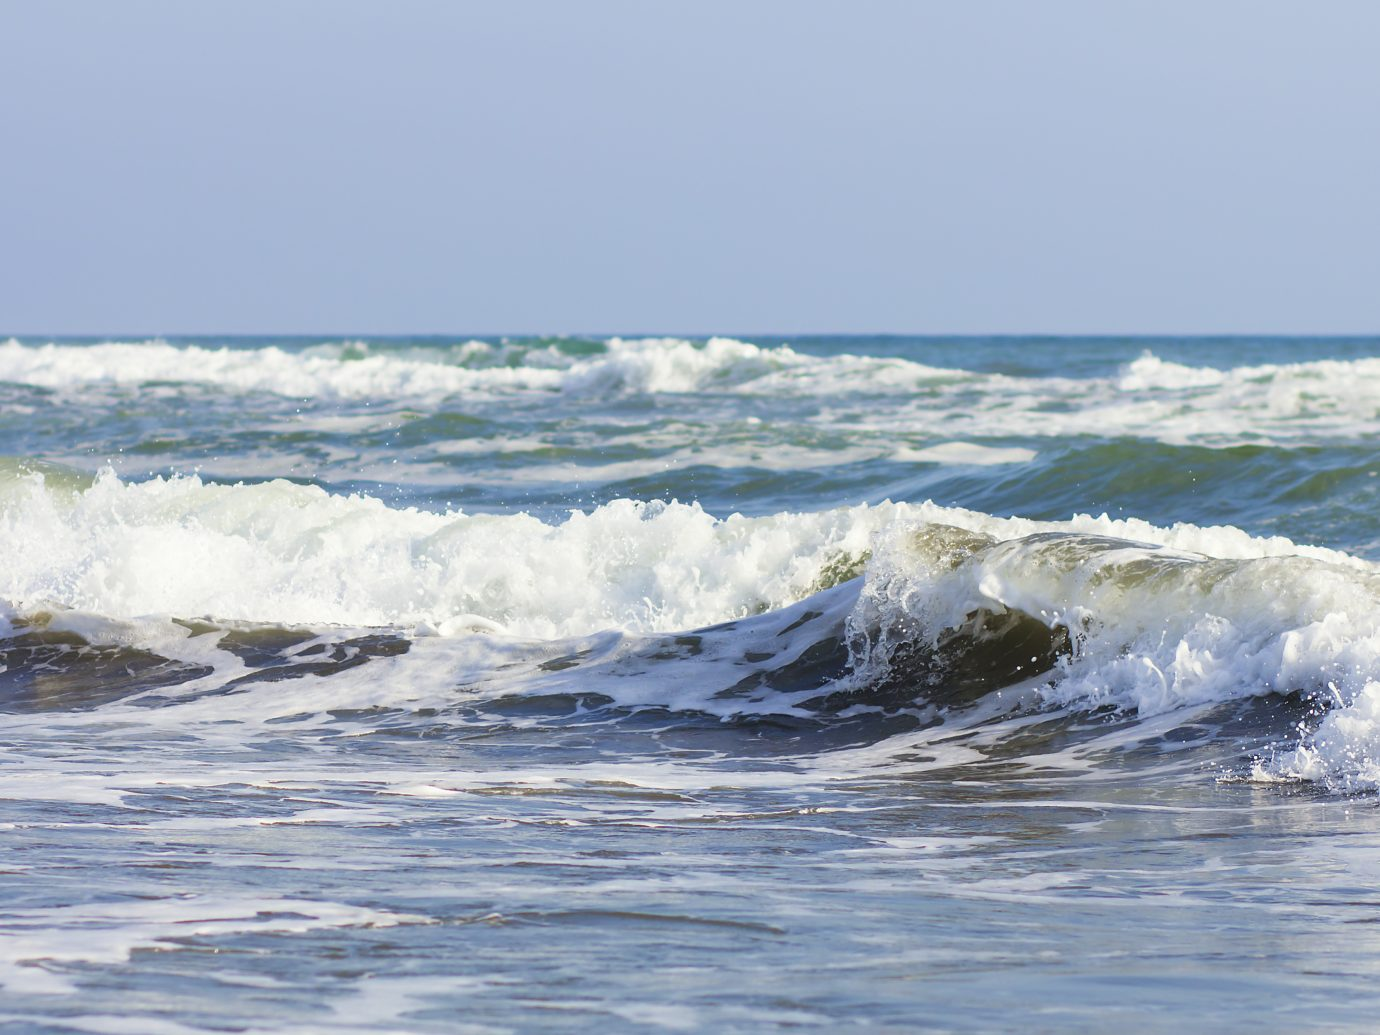 The waves at Seal Beach